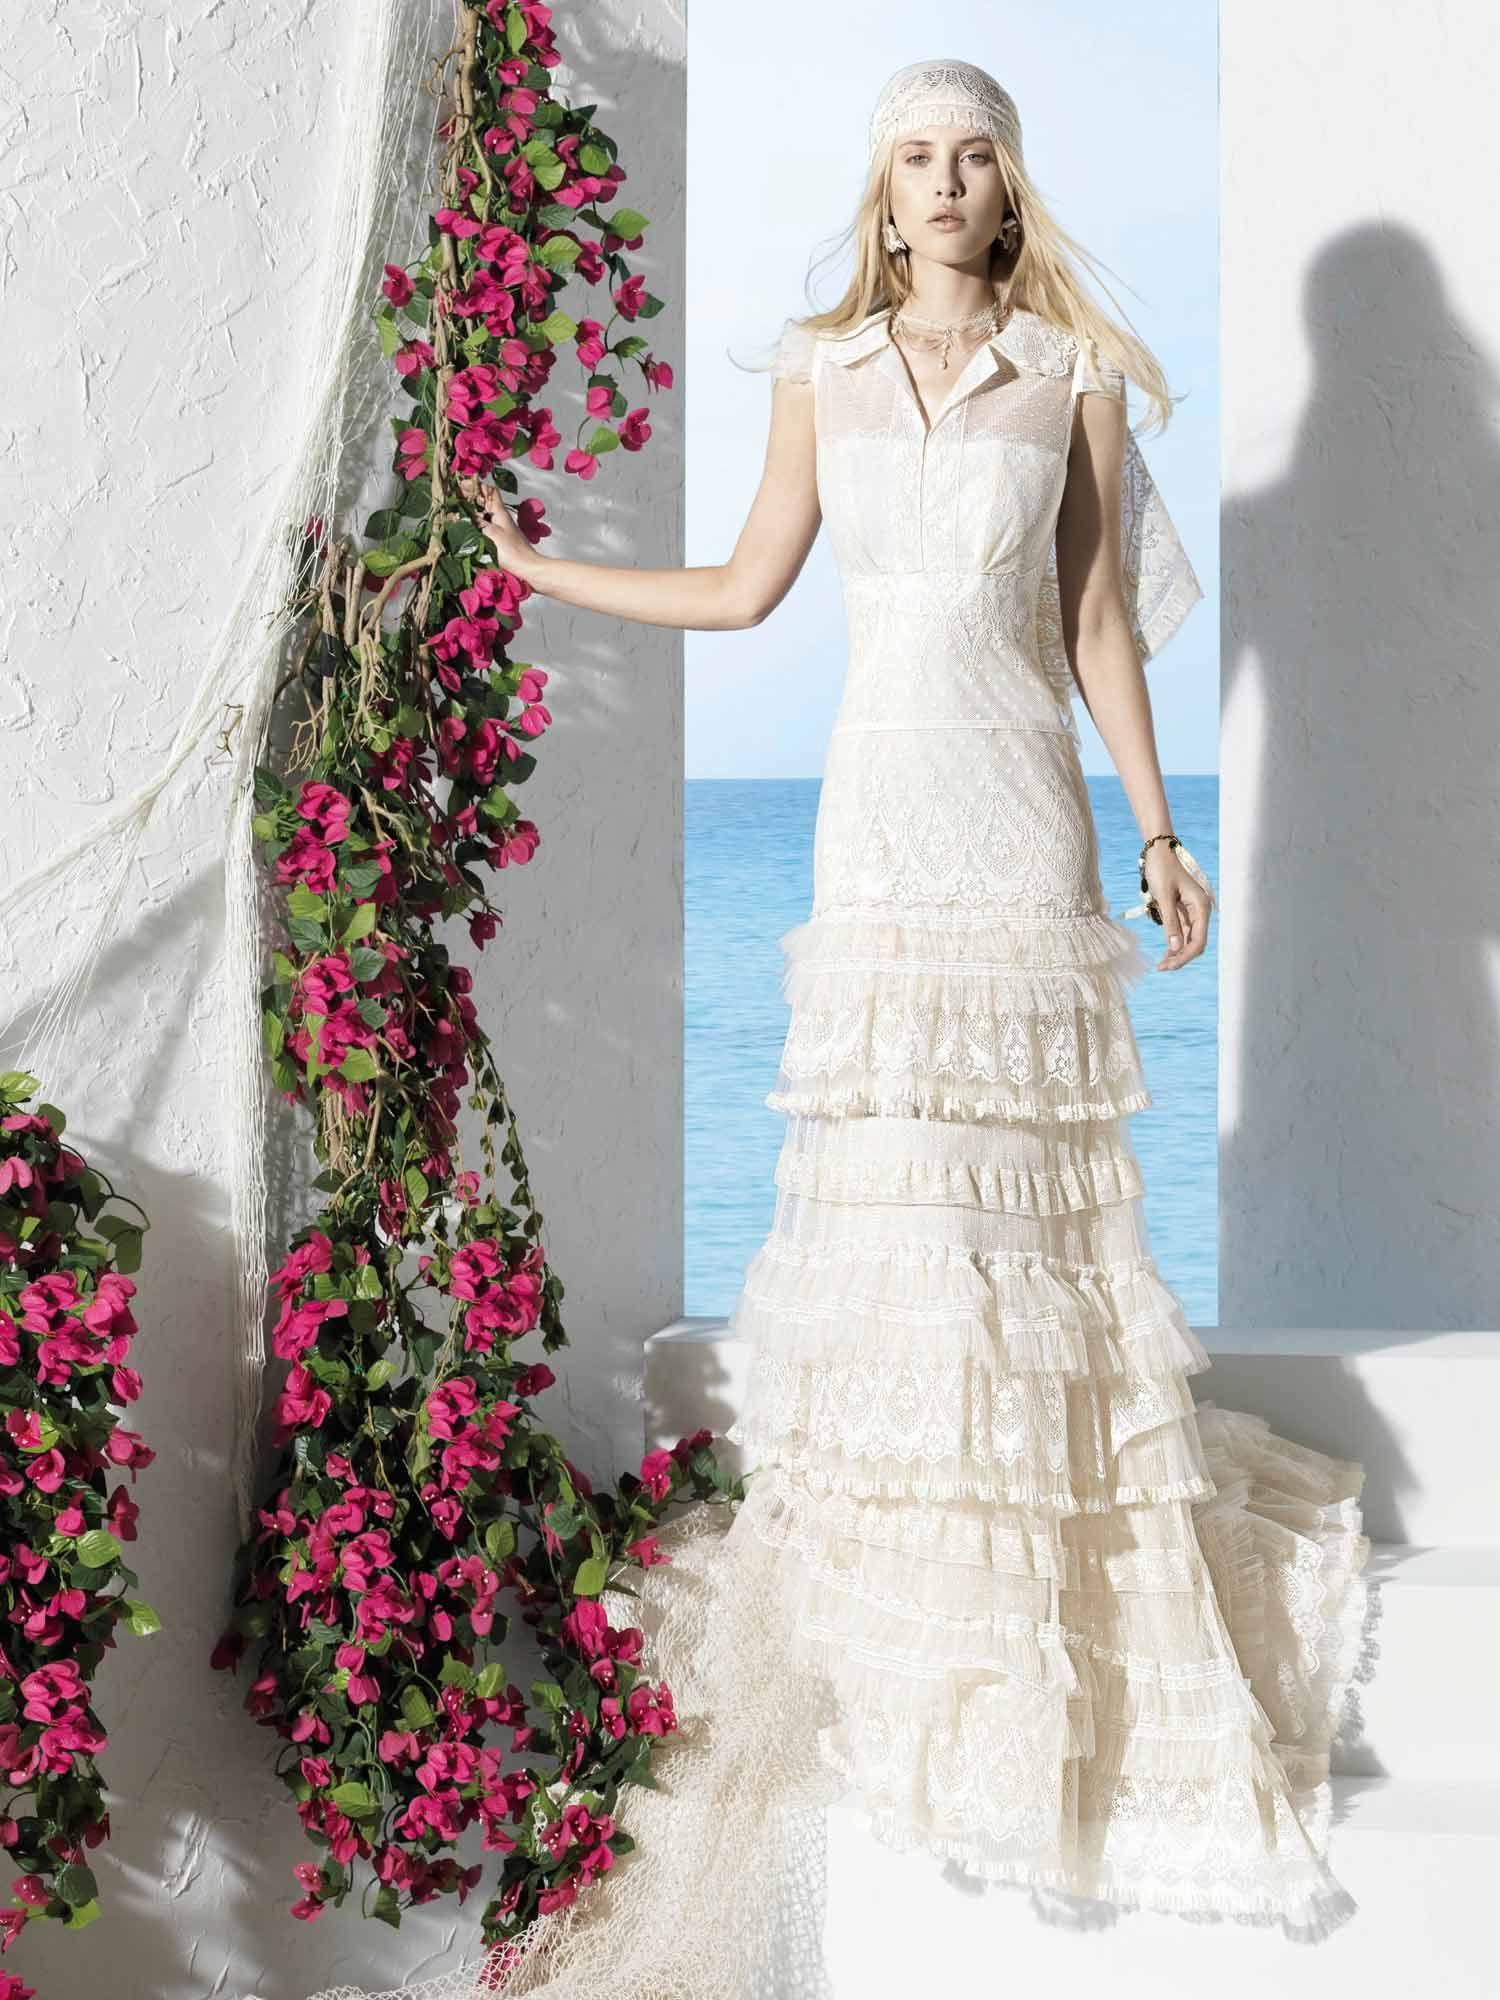 Yolancris boho chic wedding dresses boho girl by yolancris balık